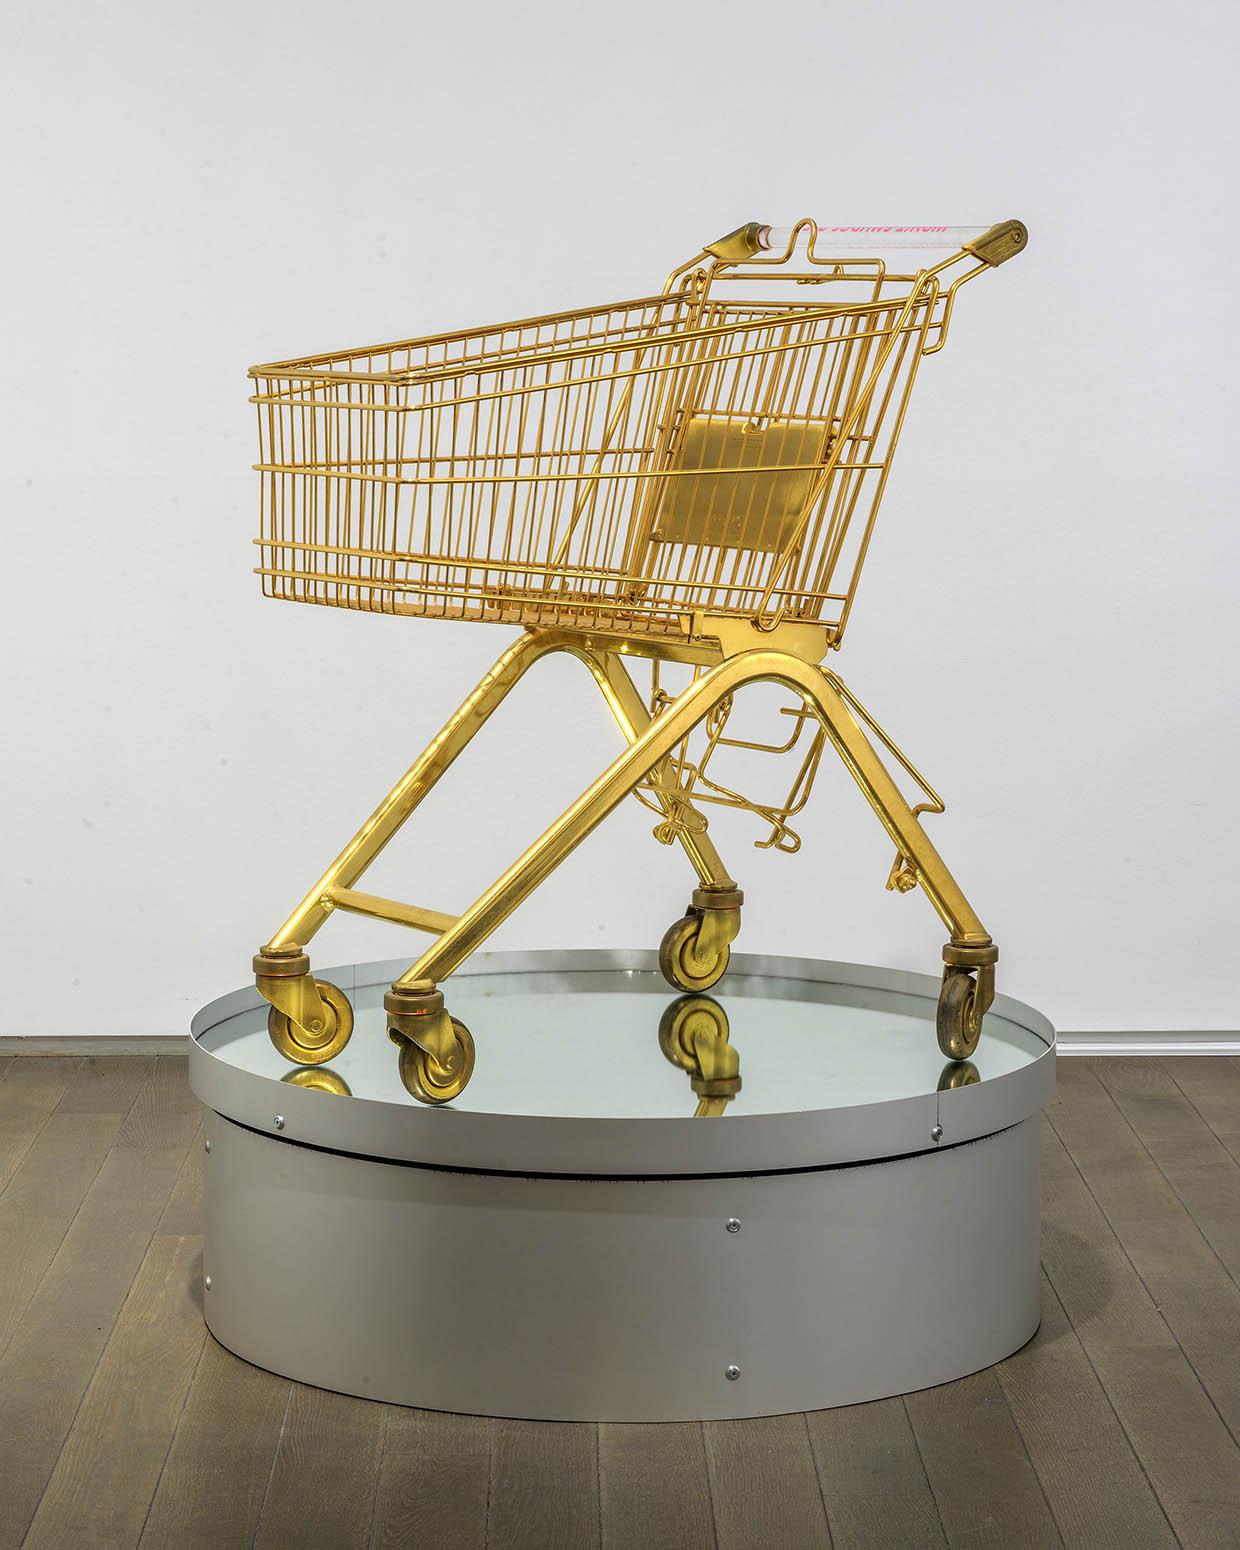 Sylvie Fleury, Serie ELA 75K (Won't Smudge Off), 2000. © Sylvie Fleury. Photo Charles Duprat. Courtesy Galerie Thaddaeus Ropac, London • Paris • Salzburg